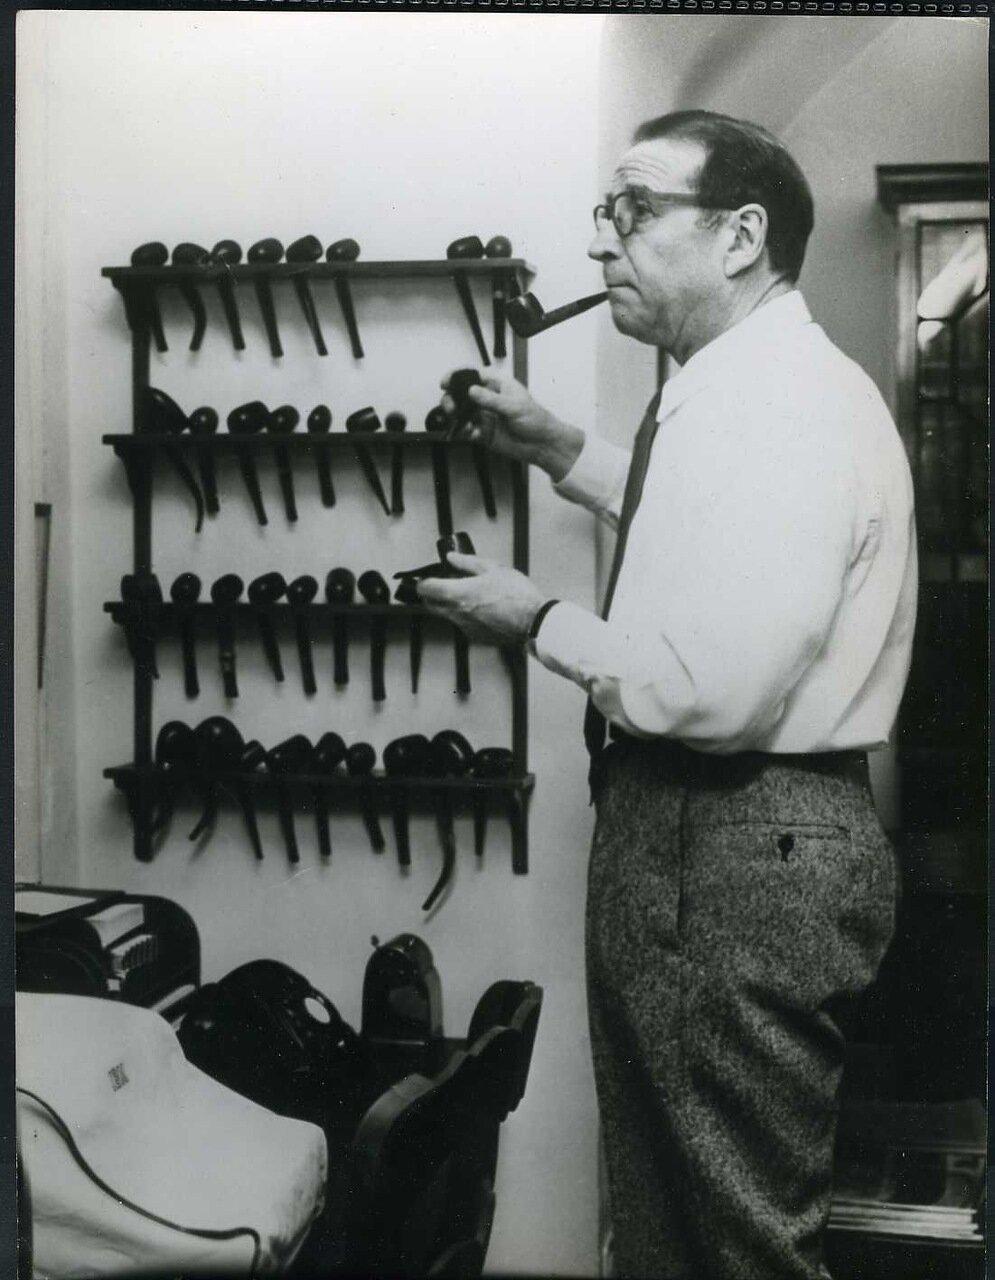 1960. ���� ������� (��������) �� ����� ���������� ������